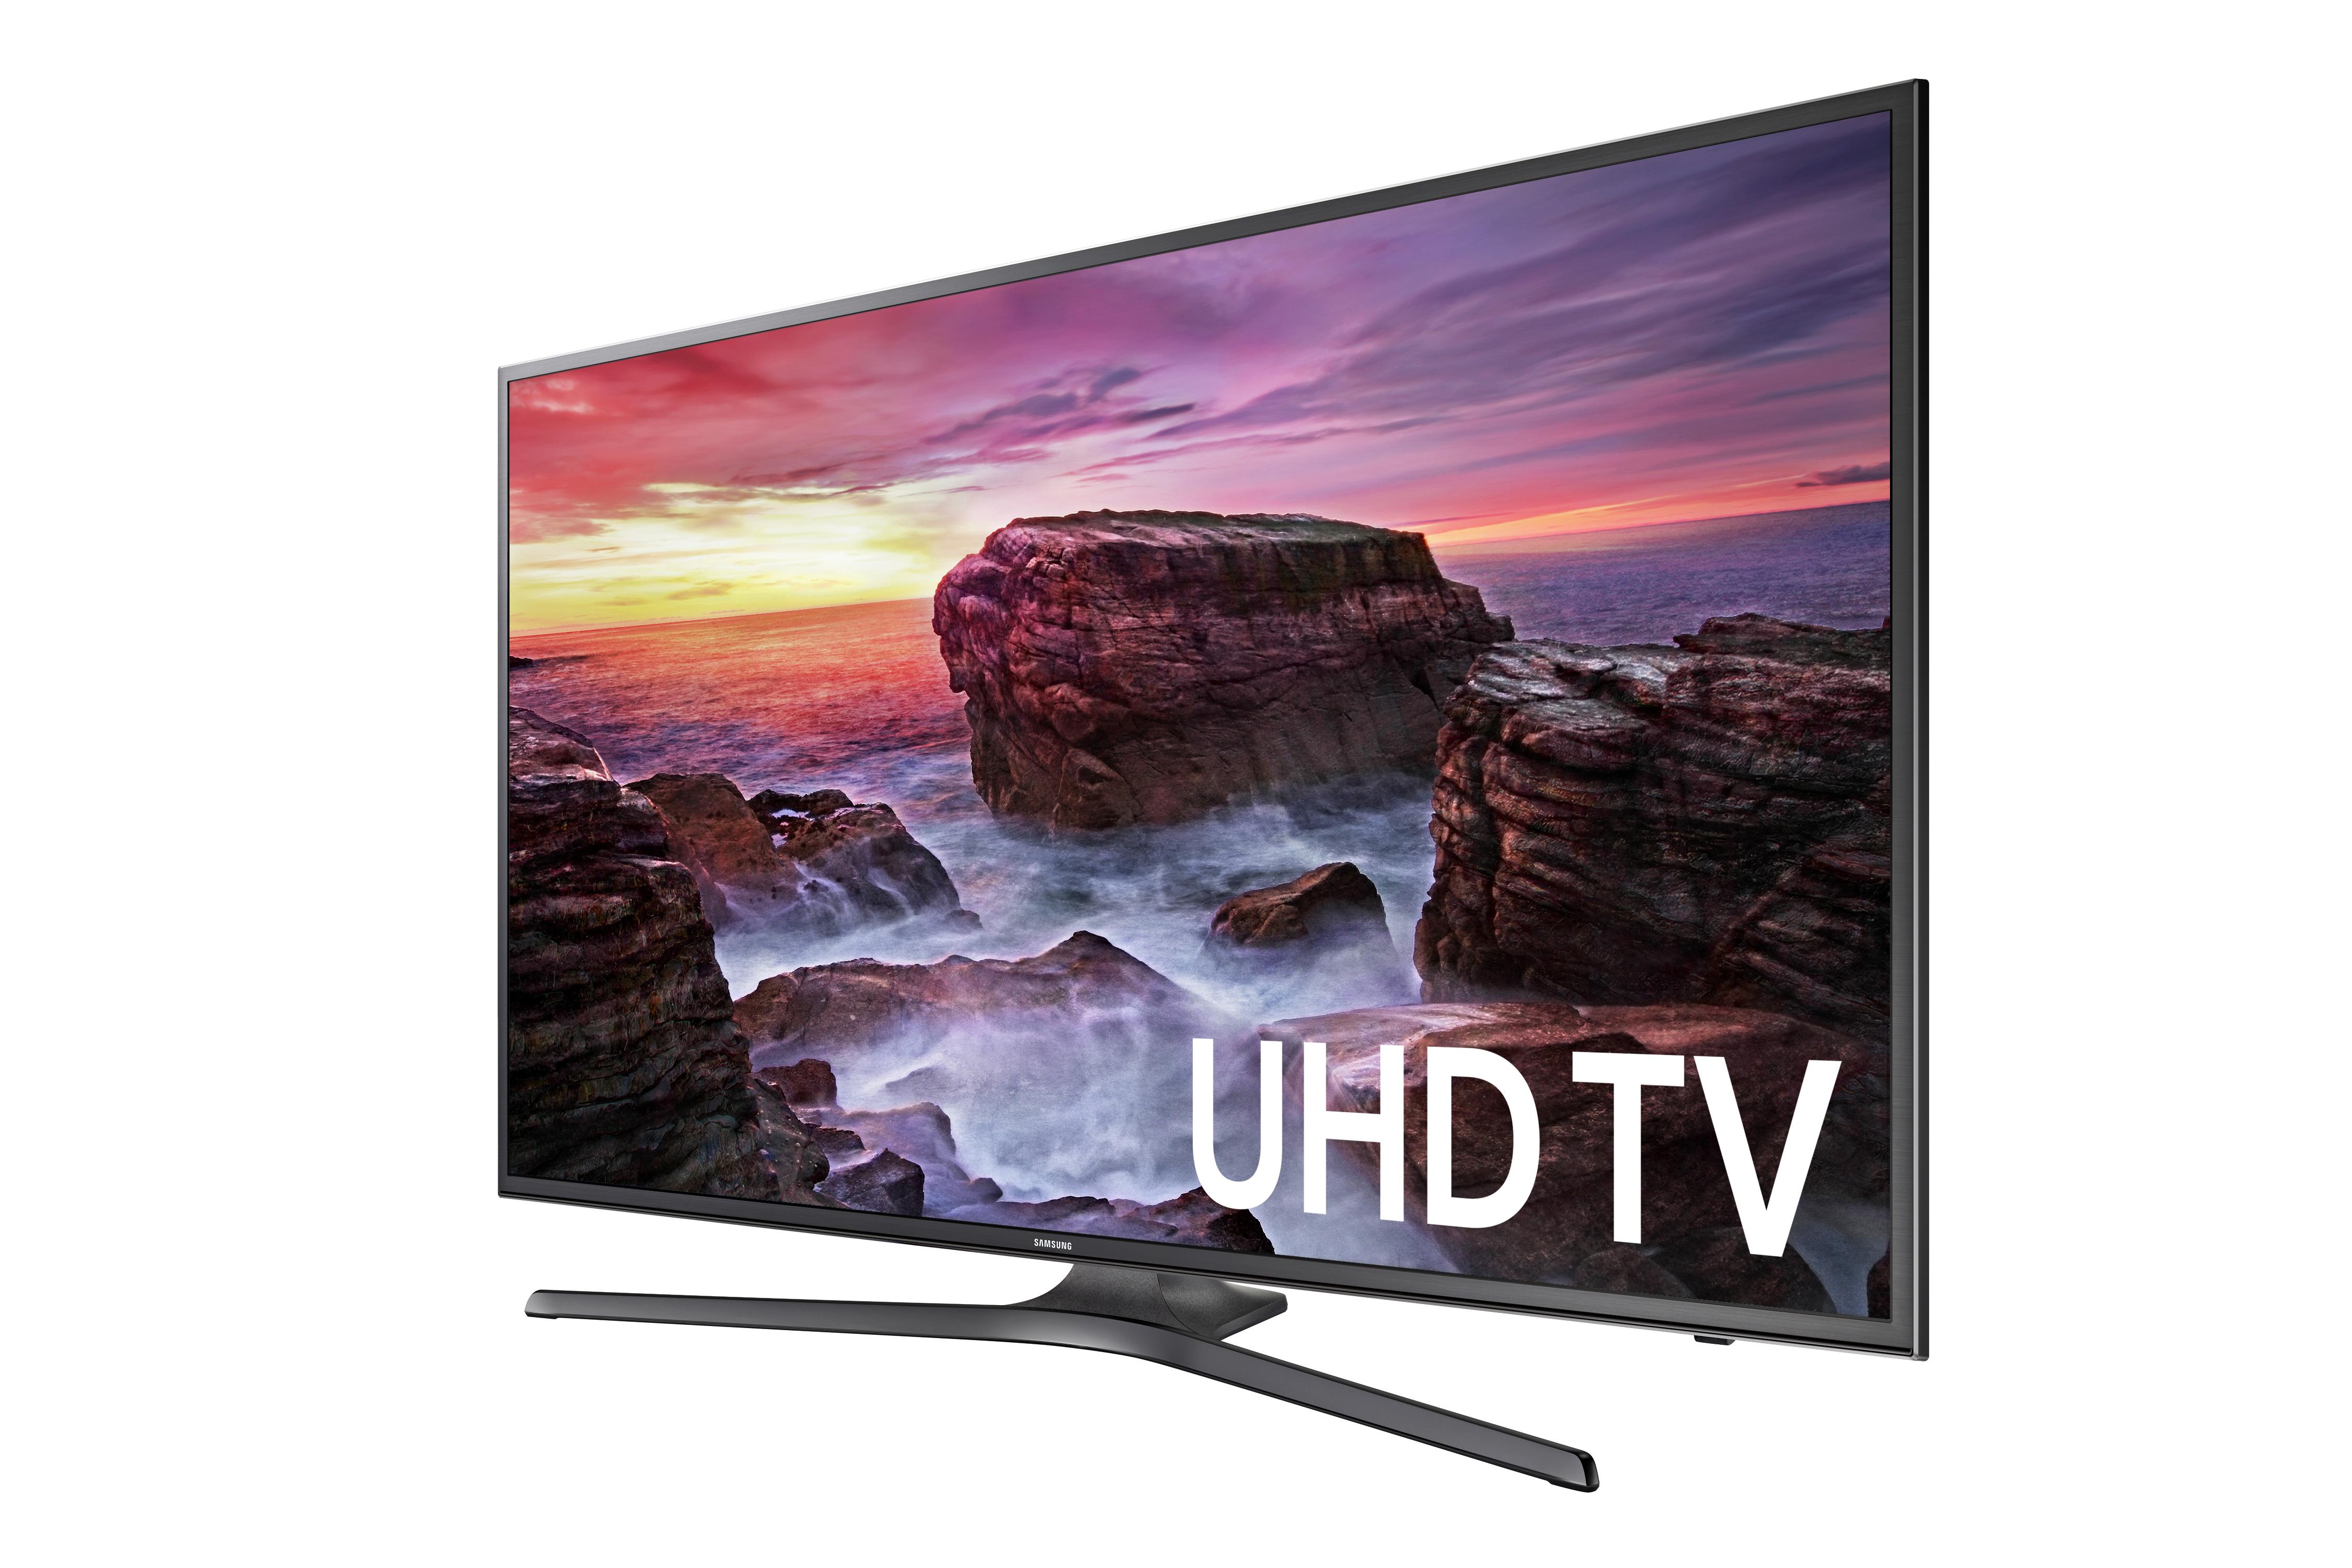 Samsung-50-034-Class-4K-2160P-Smart-LED-TV-UN50MU6300FXZA thumbnail 5